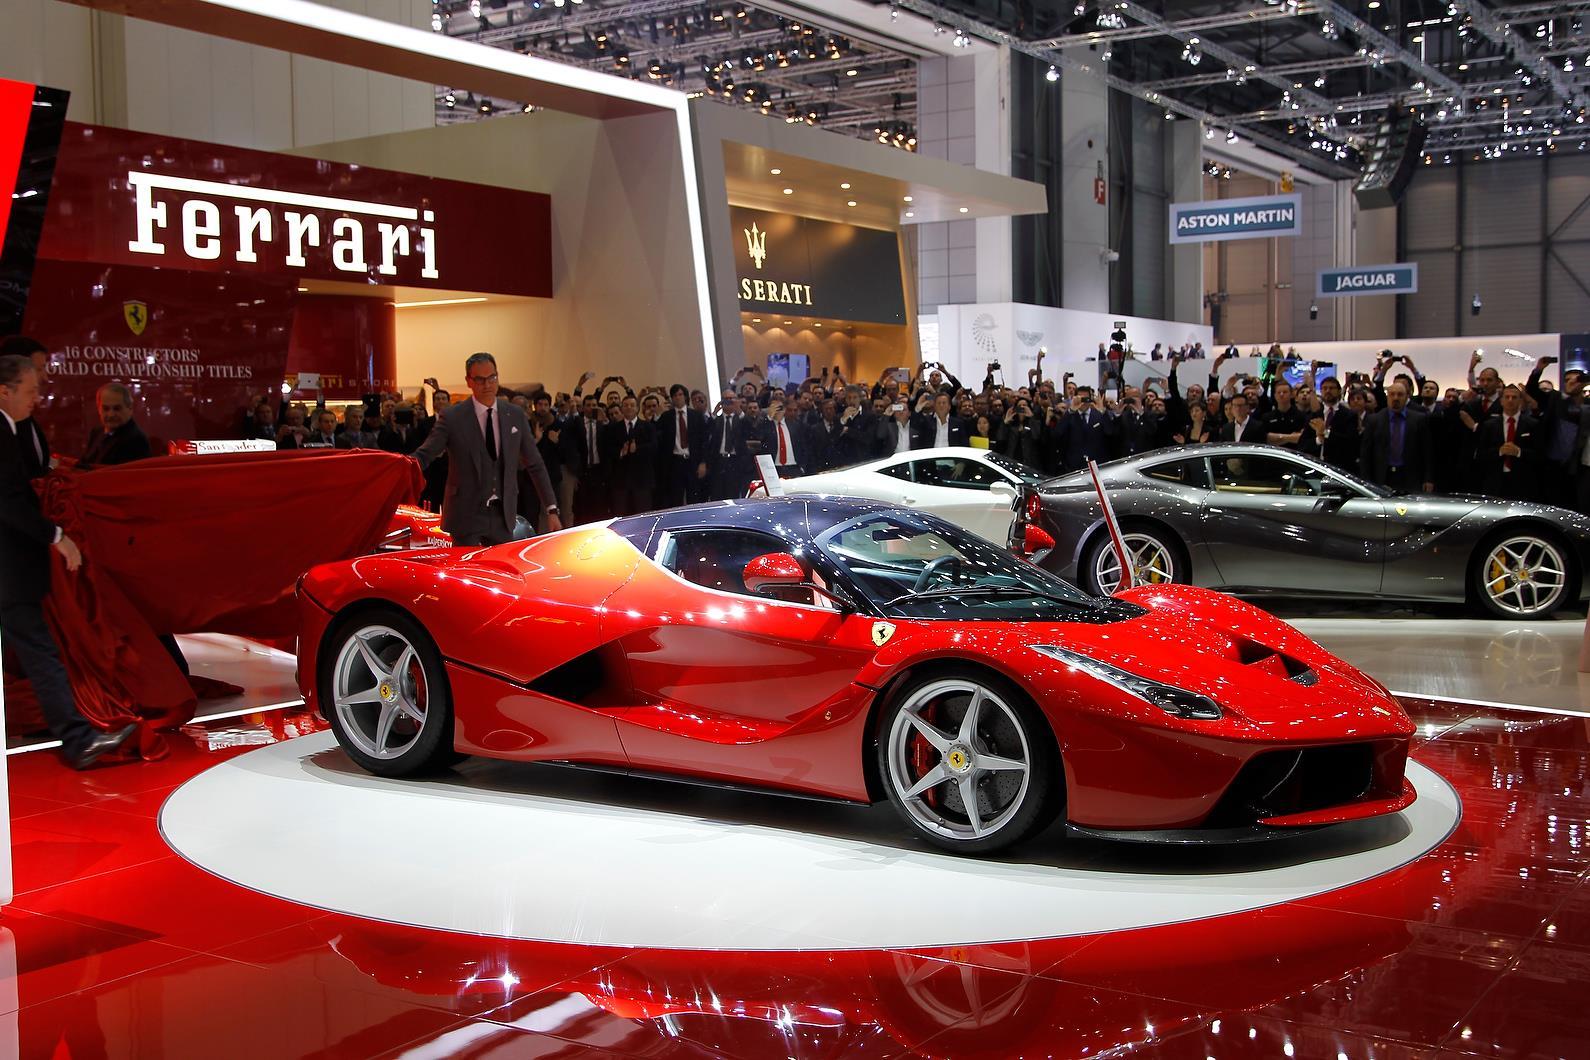 Geneva Motor Show 2013 video report